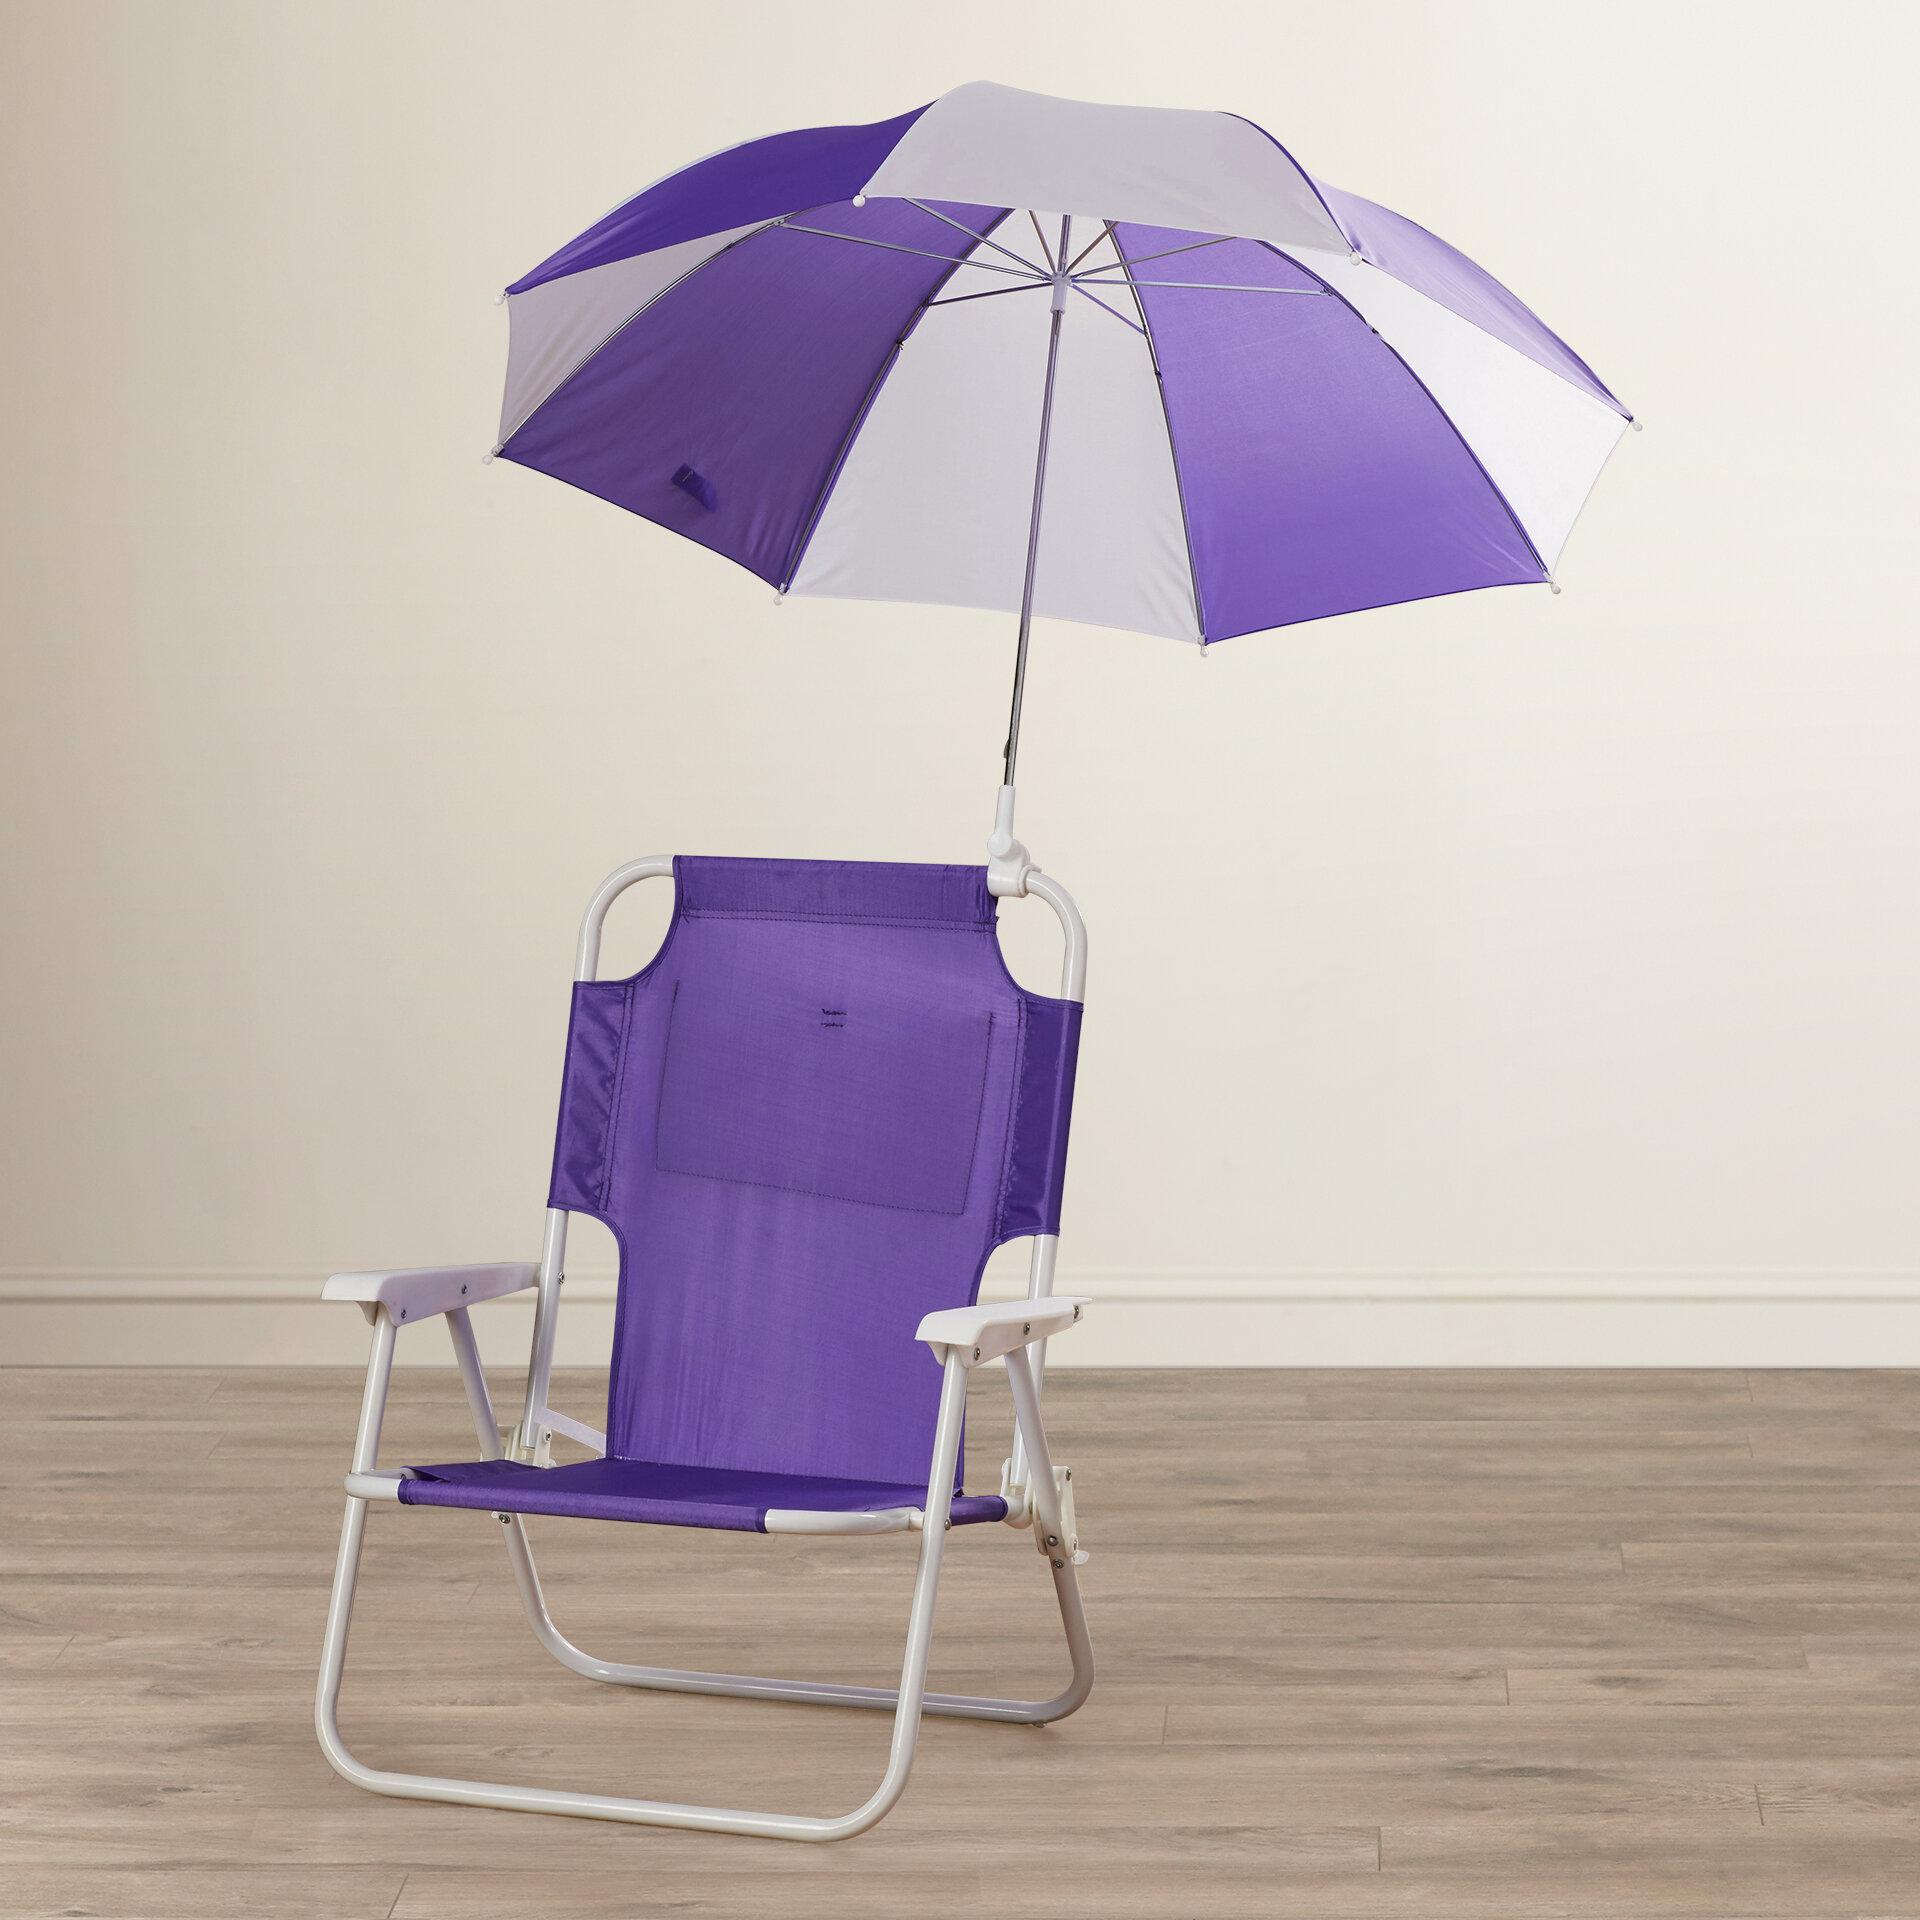 pvc watch holder chair beach umbrella youtube hacks